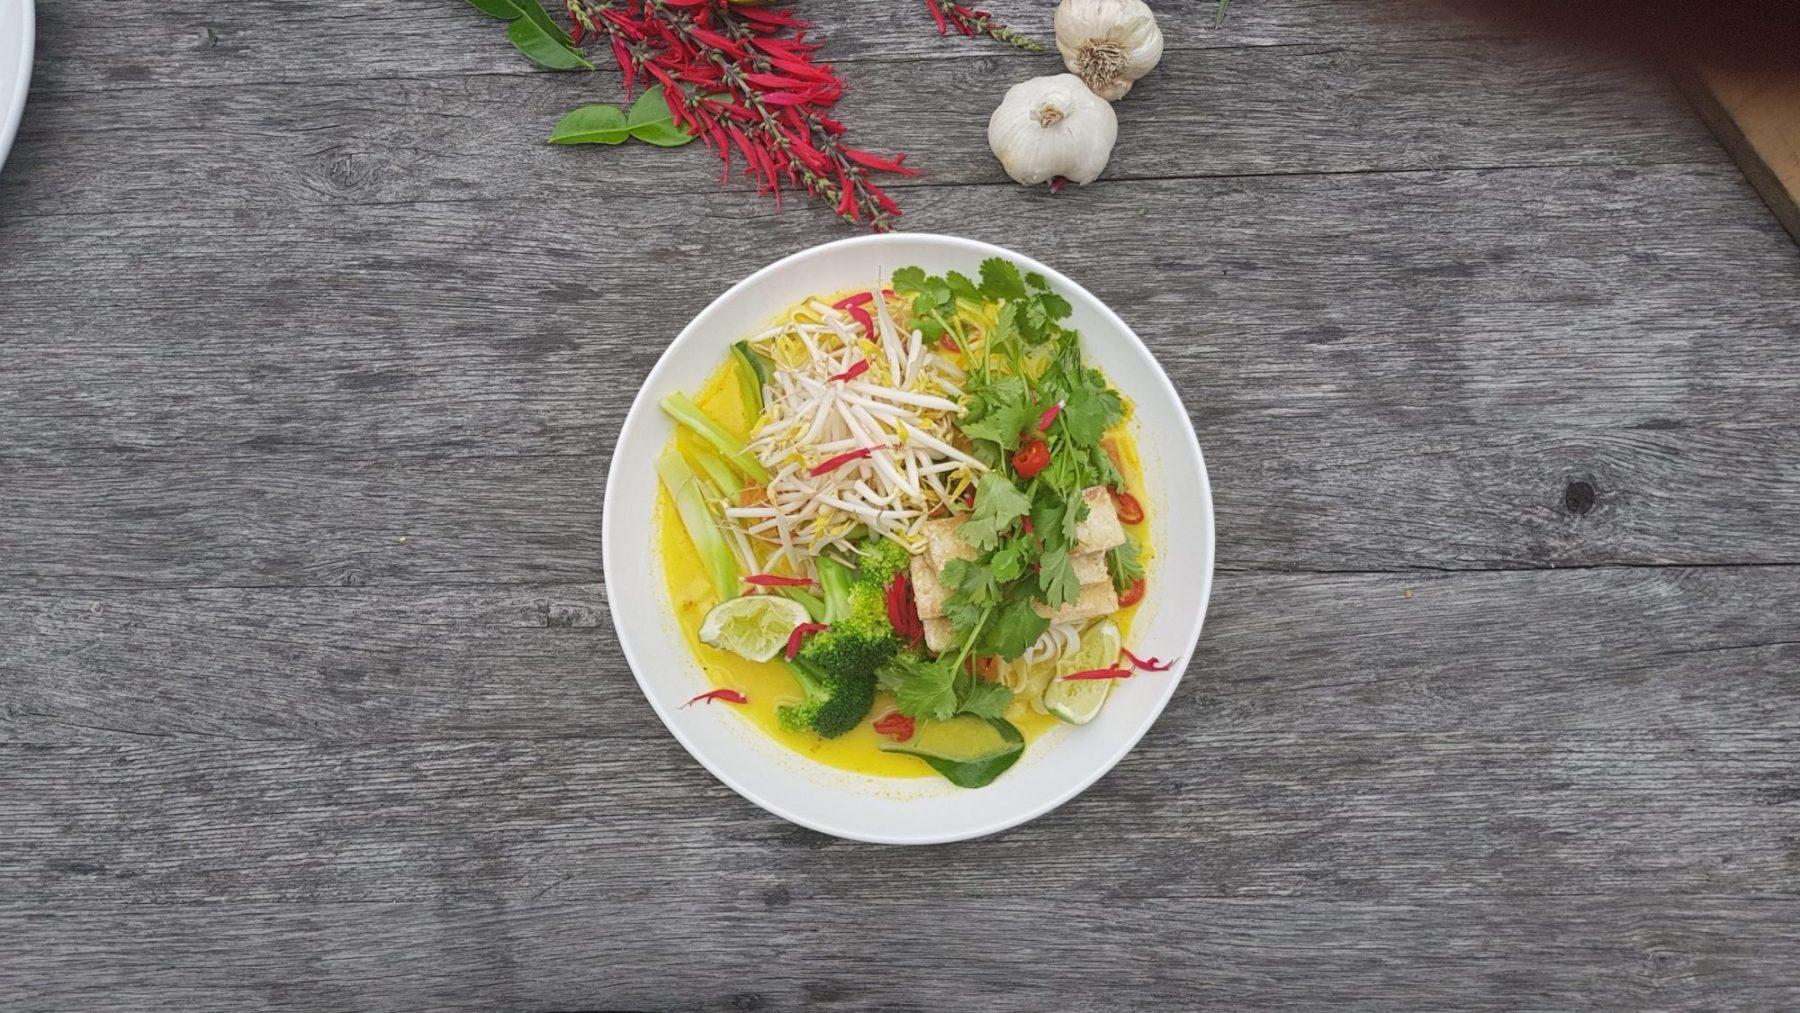 Laska with crispy tofu, broccoli, lime, bean sprouts and coriander